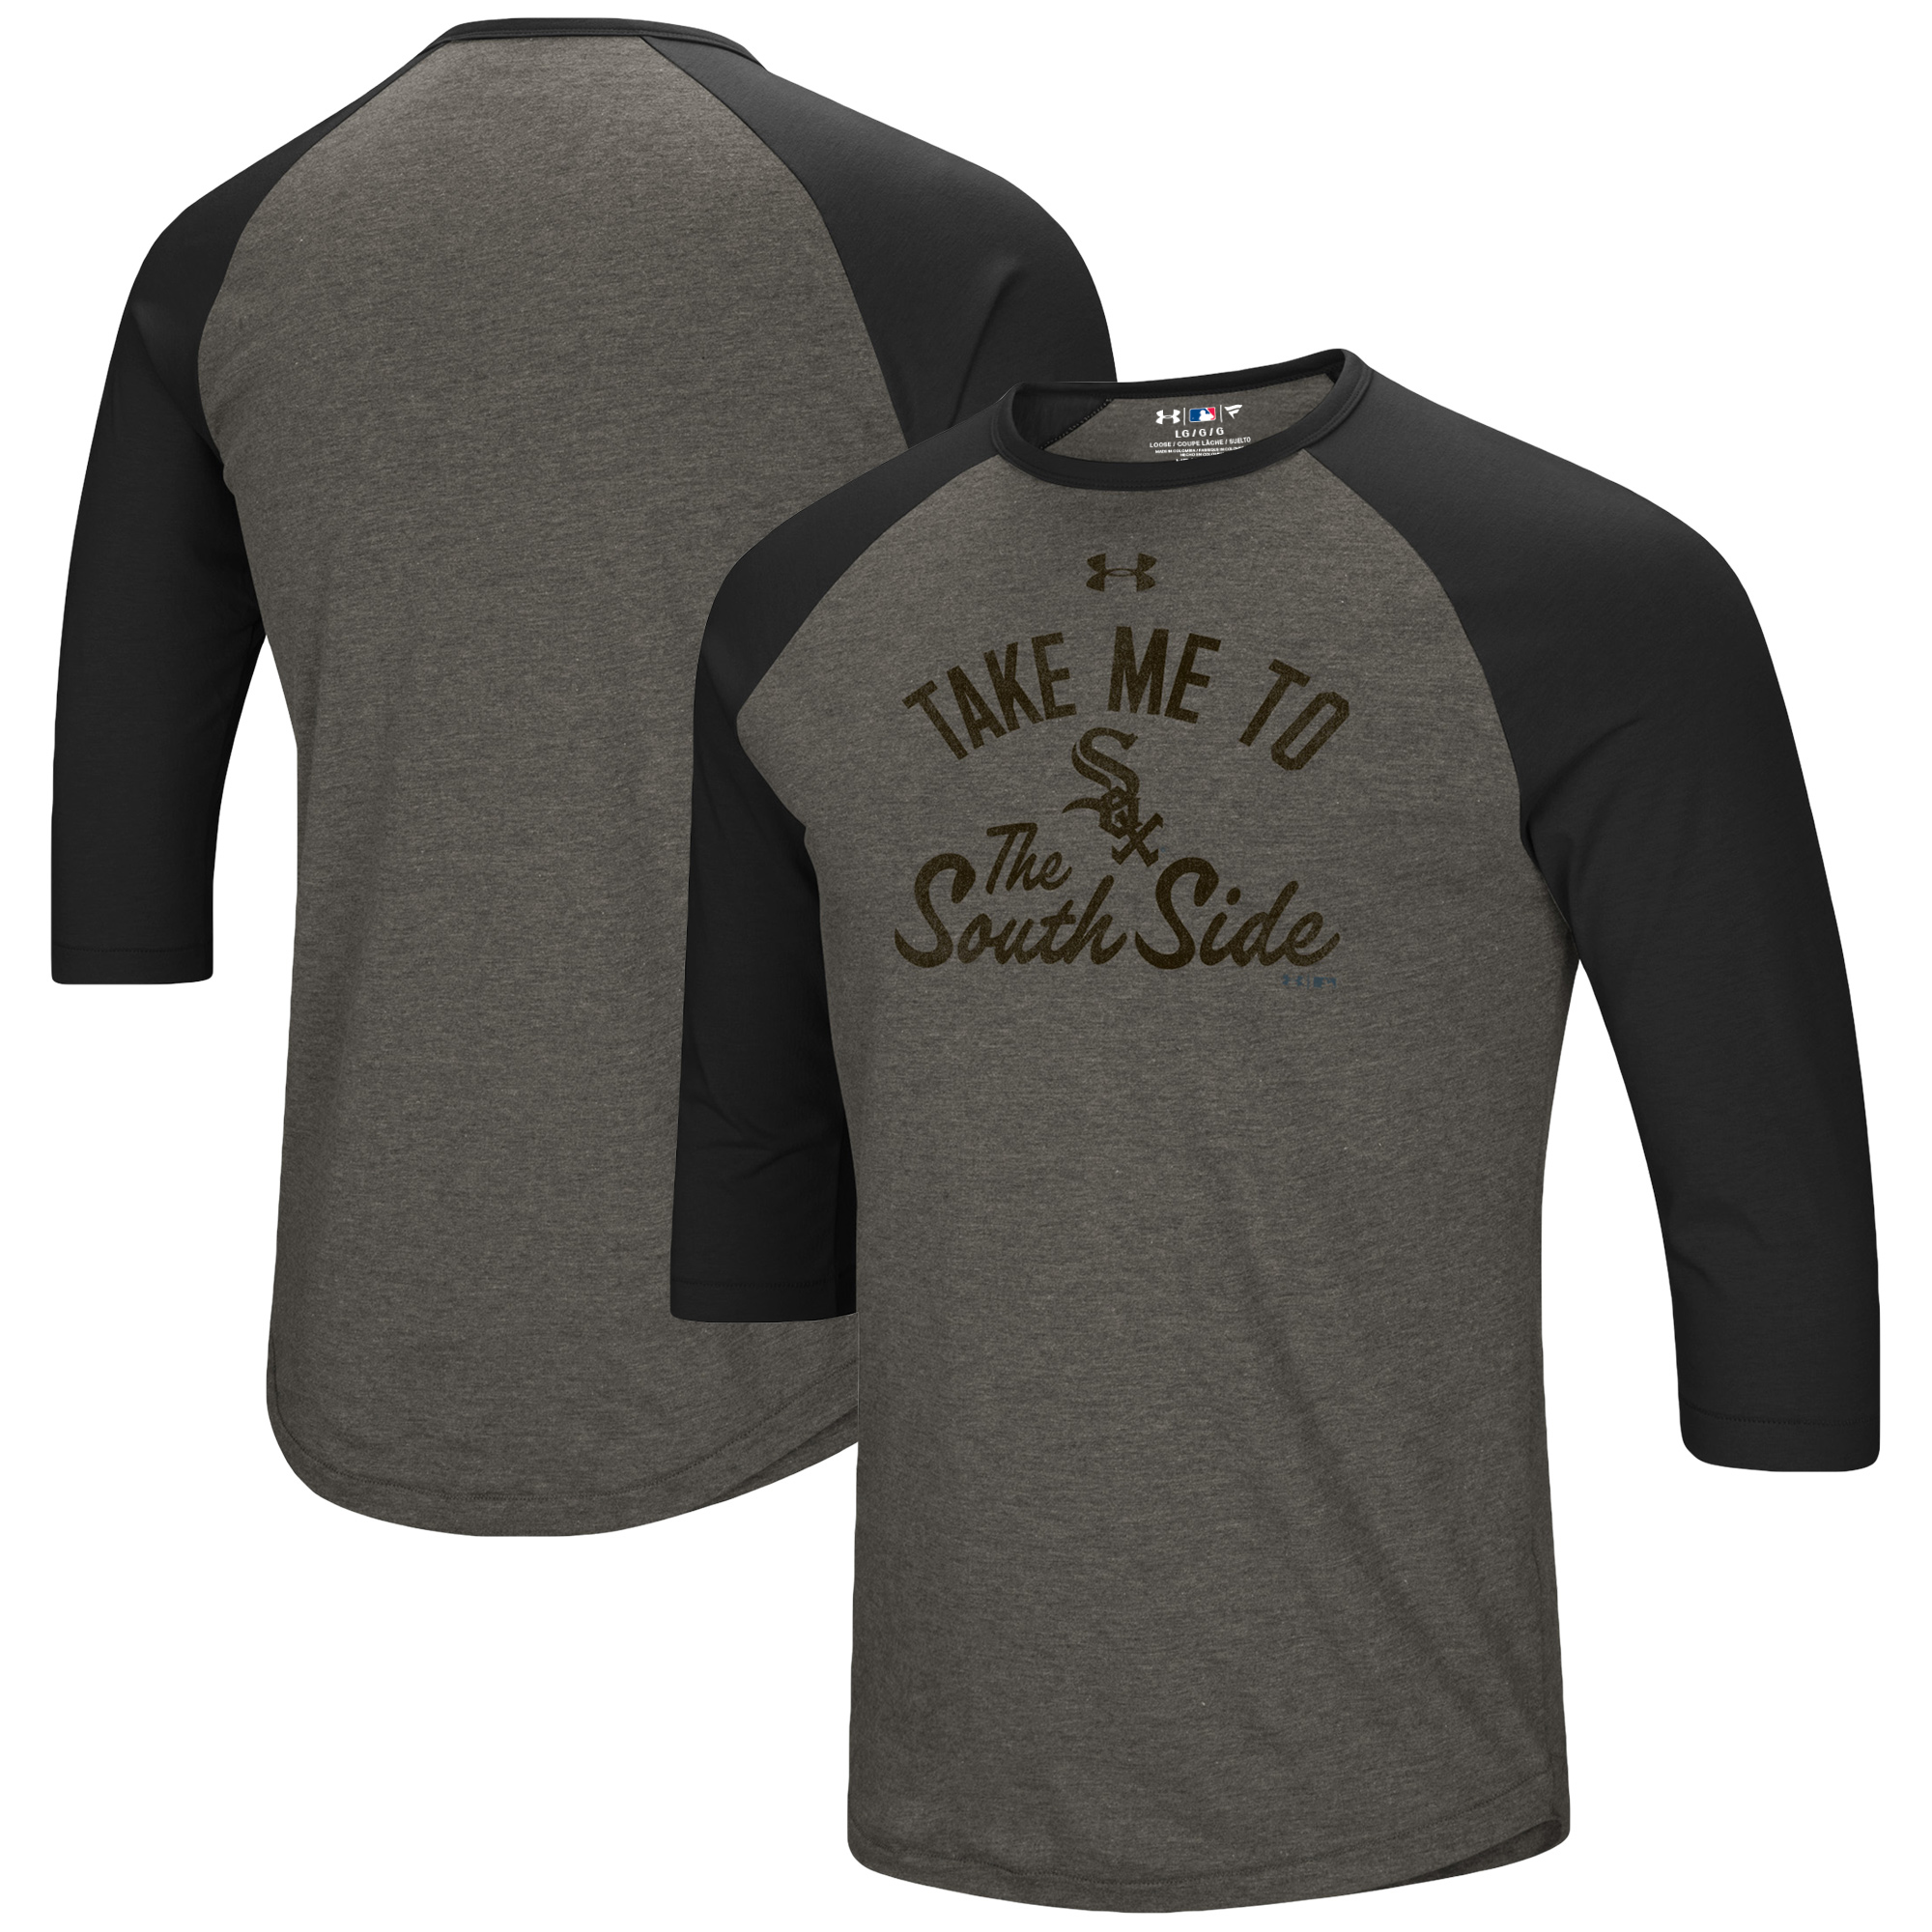 Chicago White Sox Under Armour Heritage Performance Tri-Blend Raglan 3/4-Sleeve T-Shirt - Heathered Gray/Black